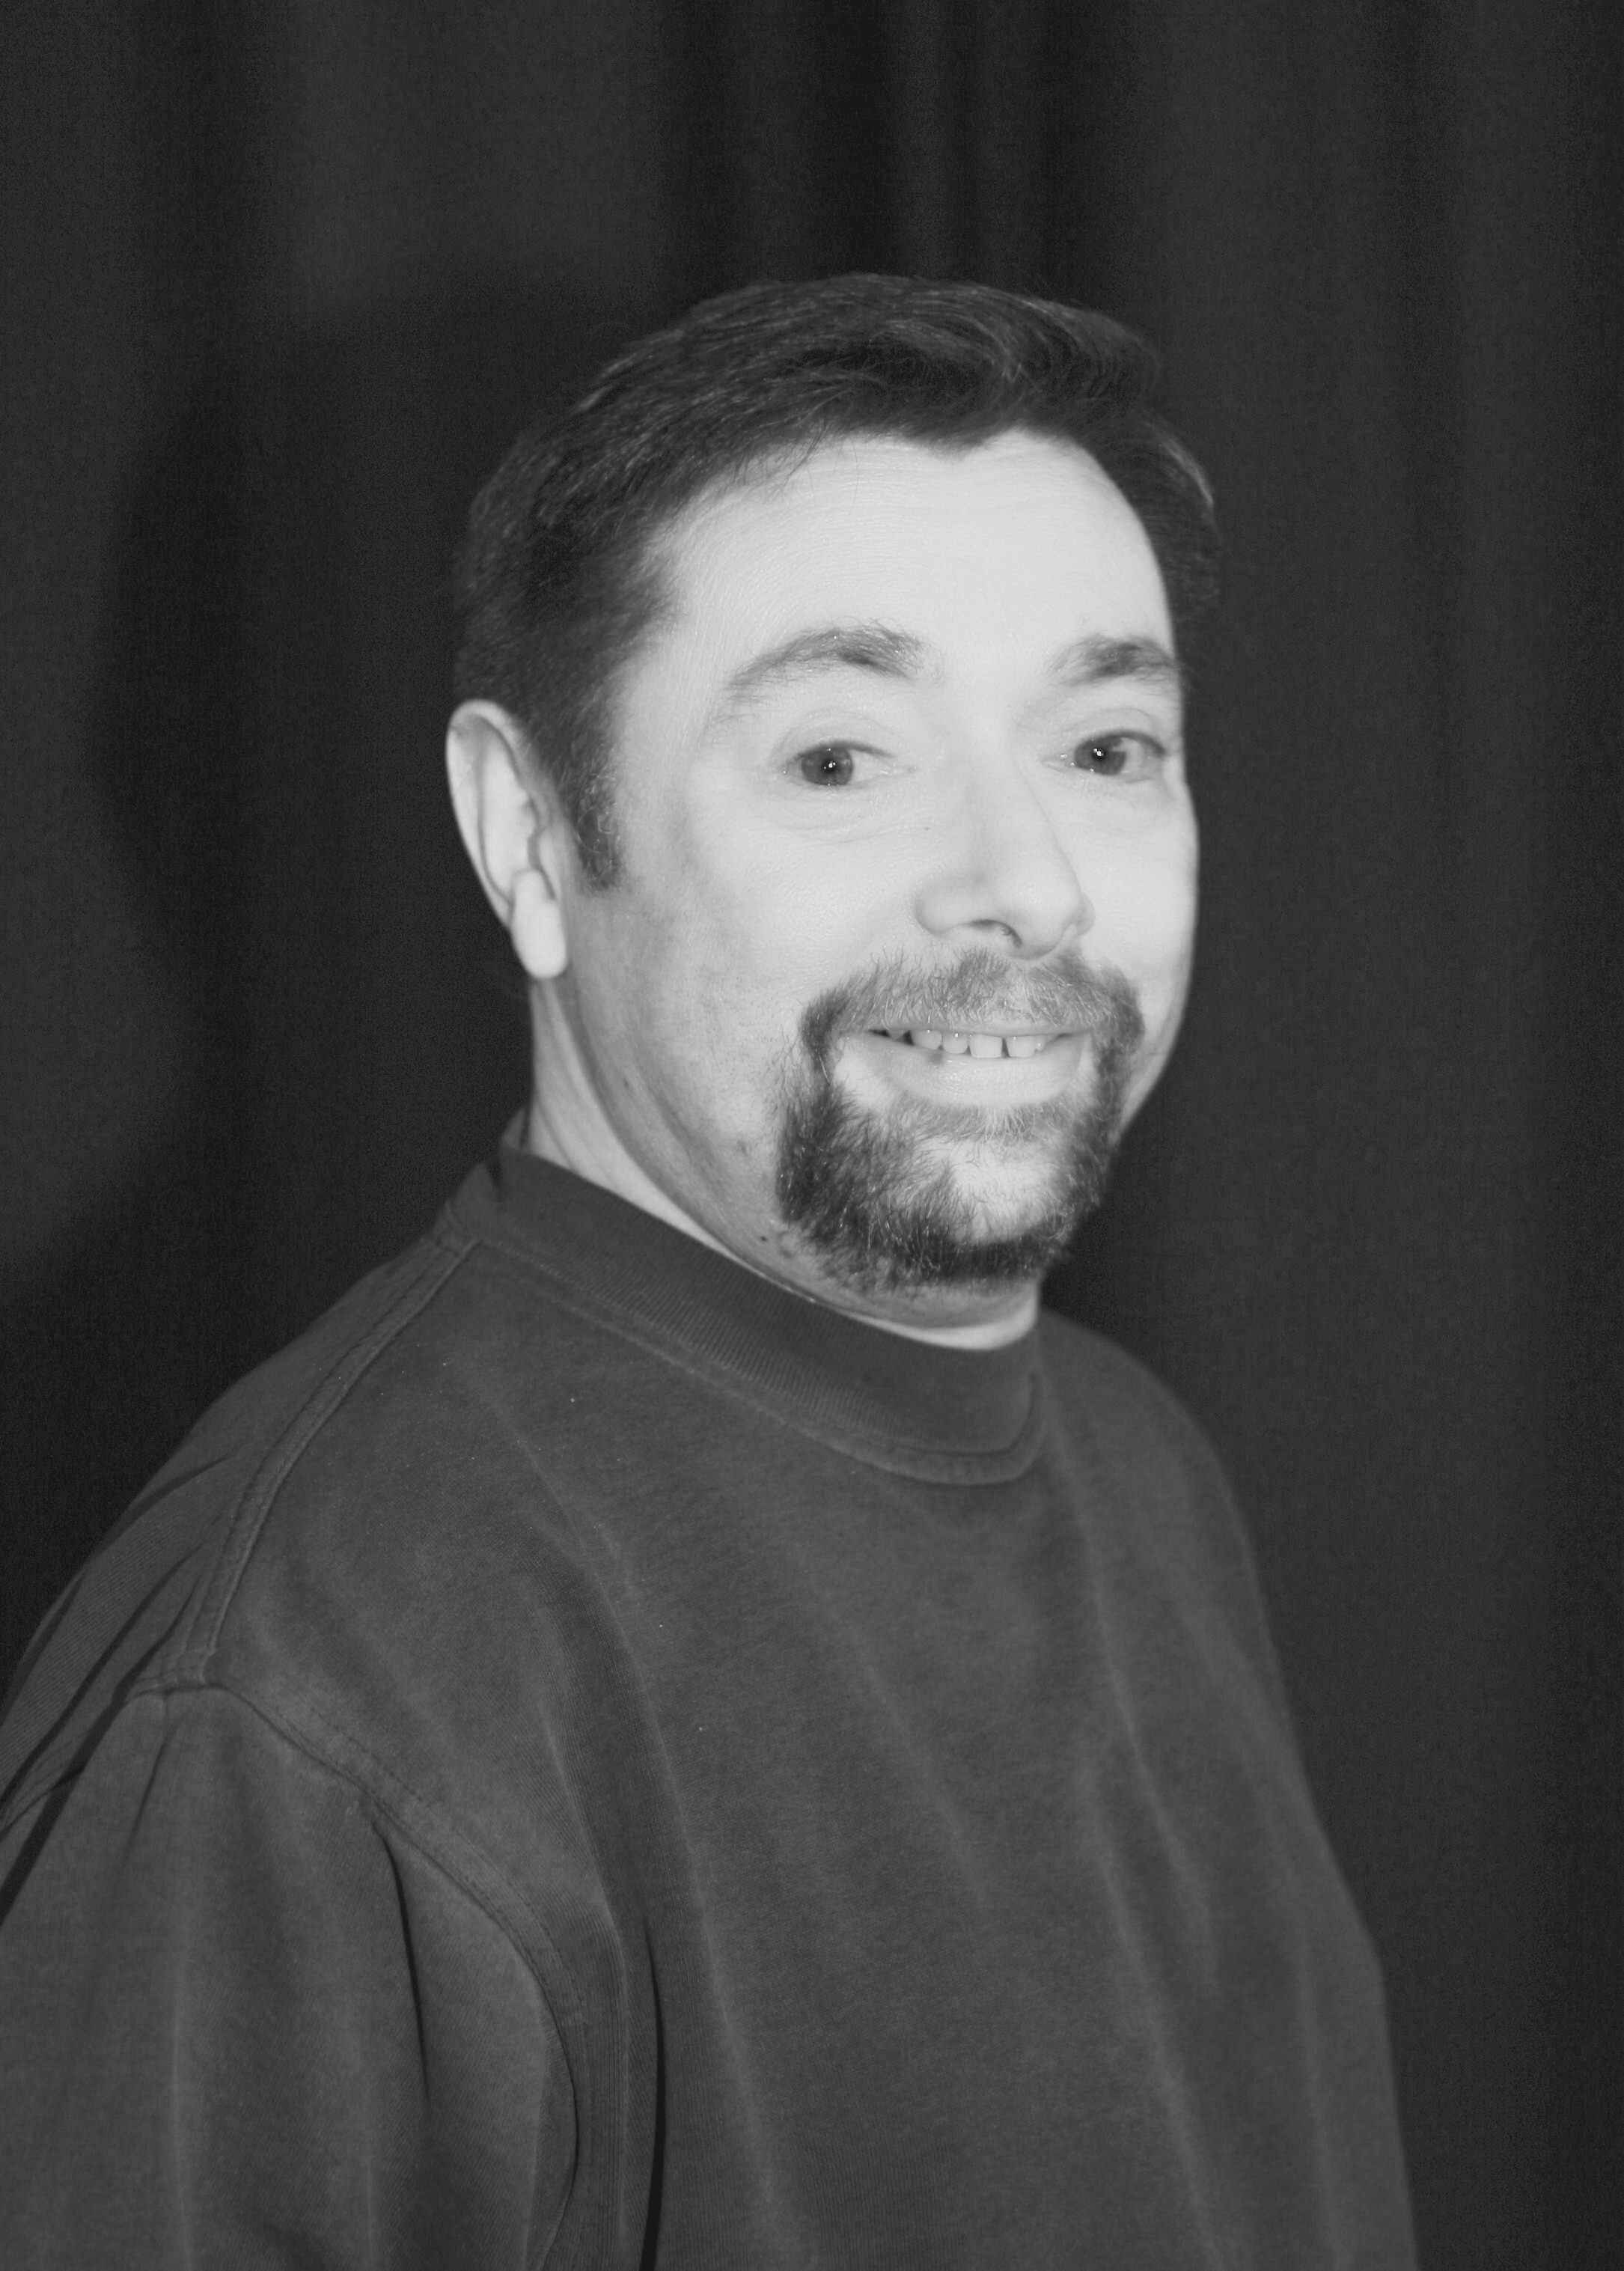 Steve Leanaghan - Norm